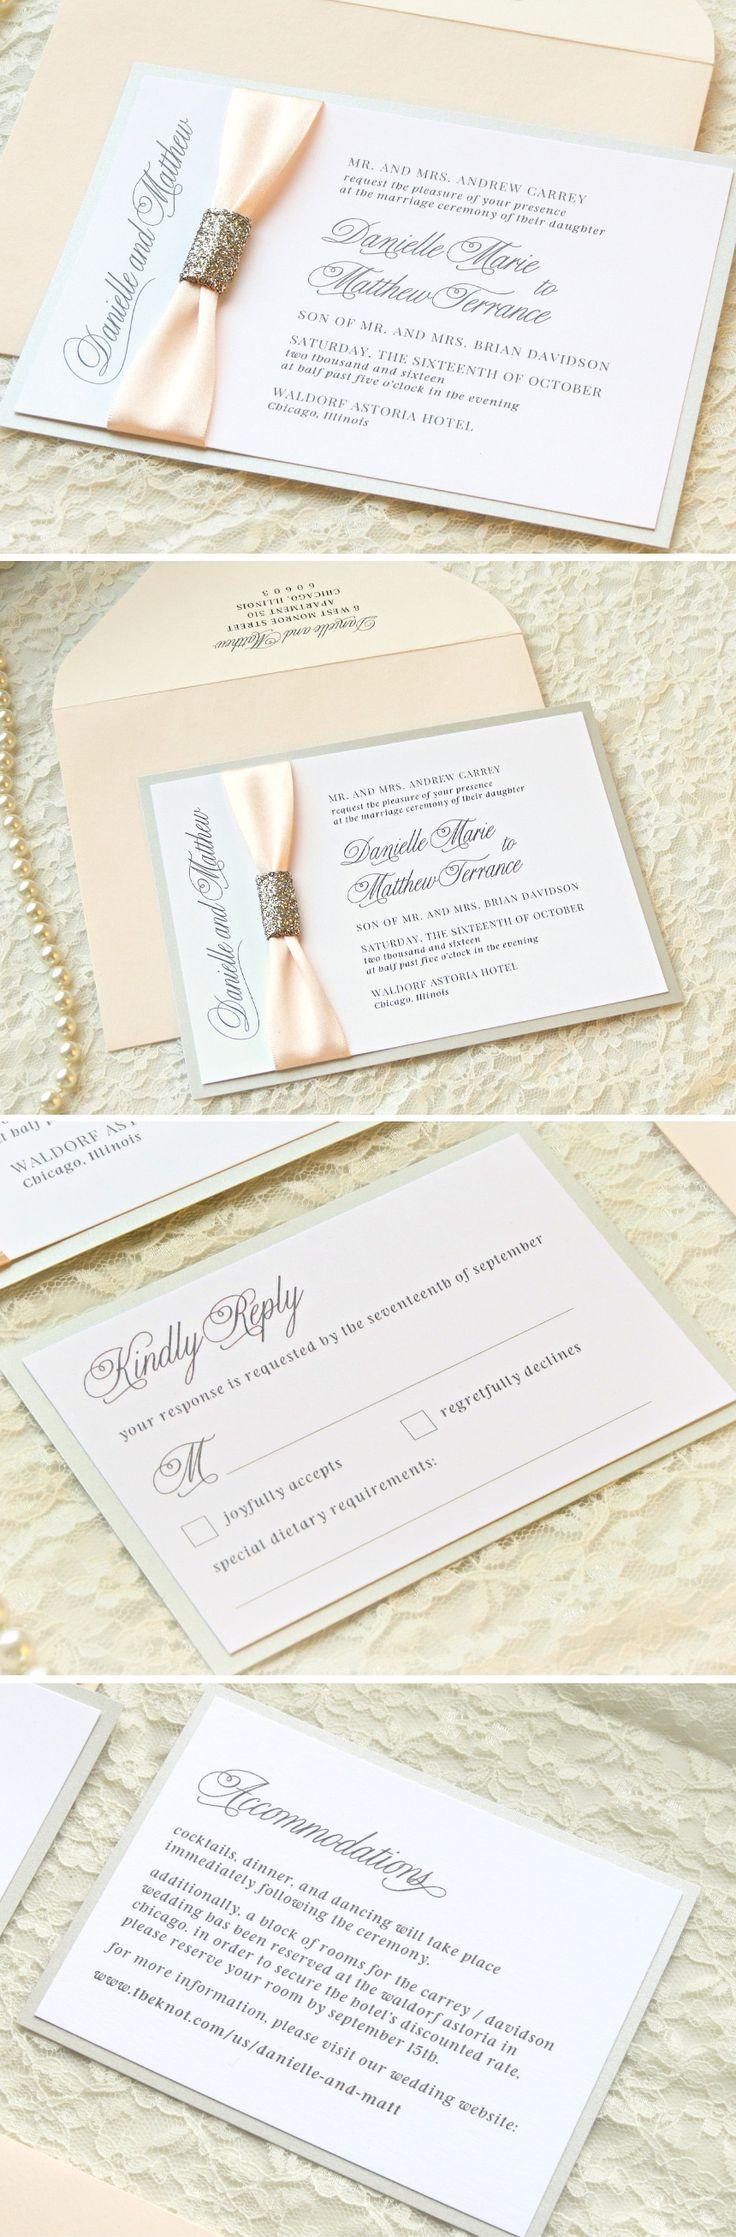 Glitzy Blush and Silver Wedding Invitation Suite - Elegant, Satin Blush Ribbon, Glitter Embellishment - Blush Wedding Invitations